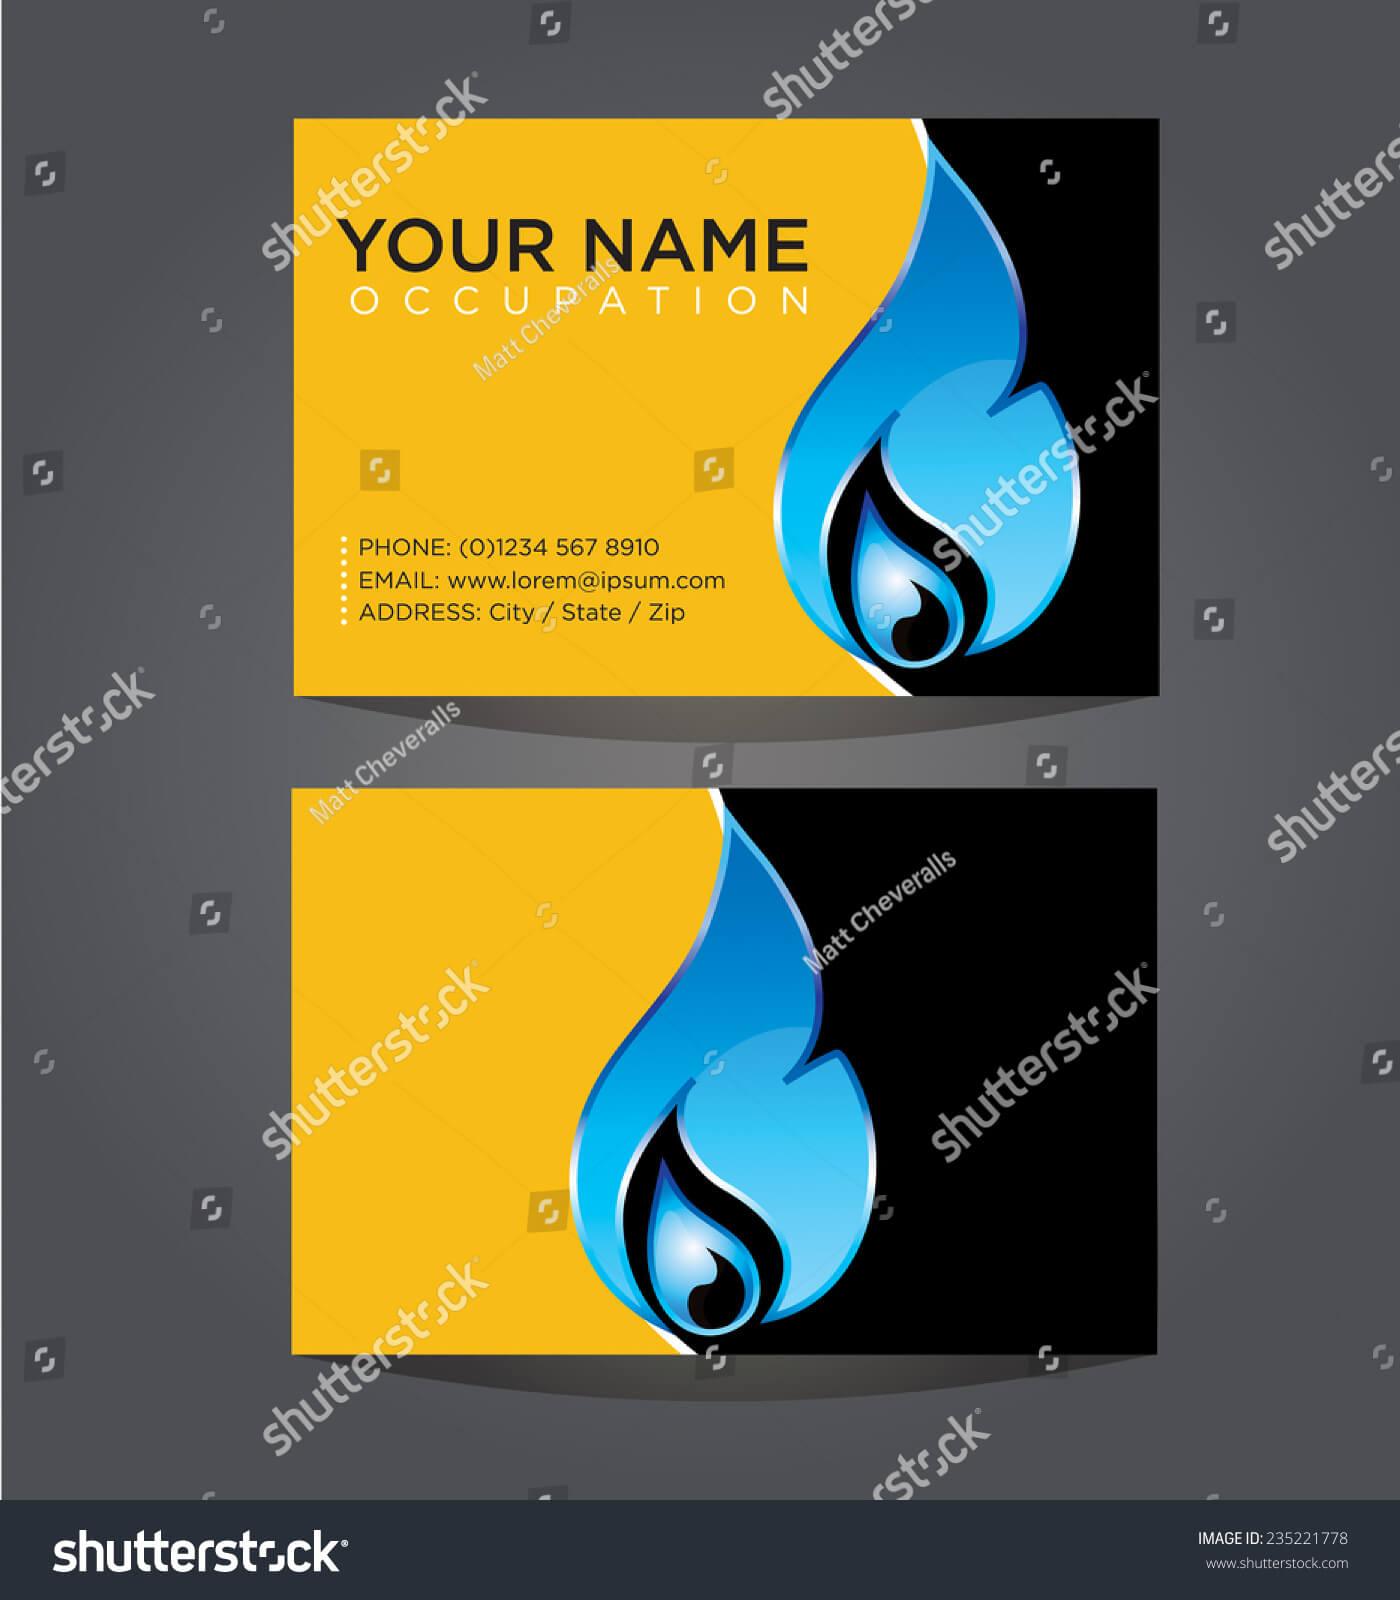 Business Card Template Plumbing Heating Air | Royalty Free In Hvac Business Card Template